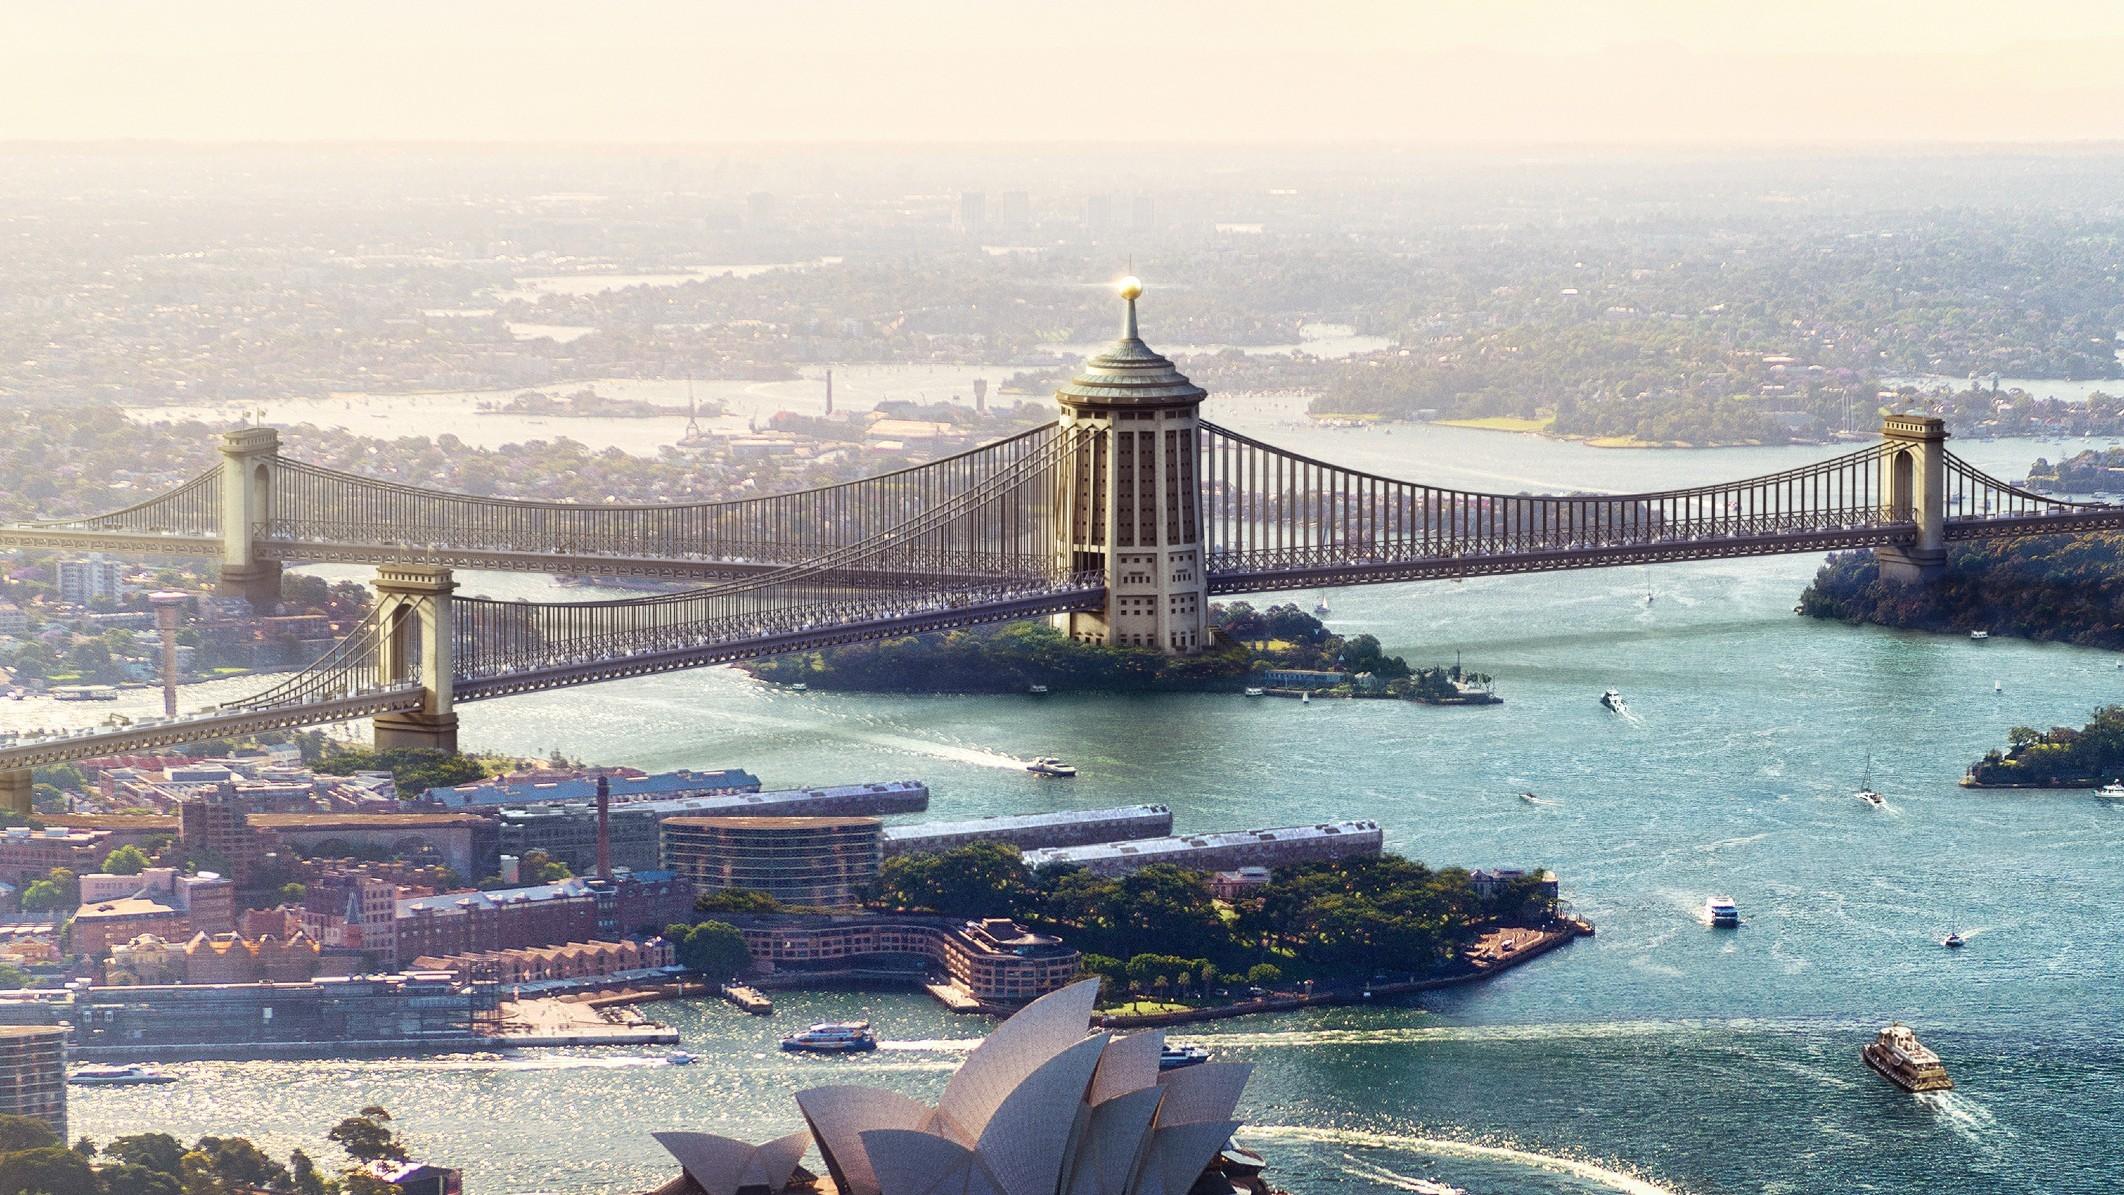 Sydney Harbour Bridge Design by F. Ernest Stowe